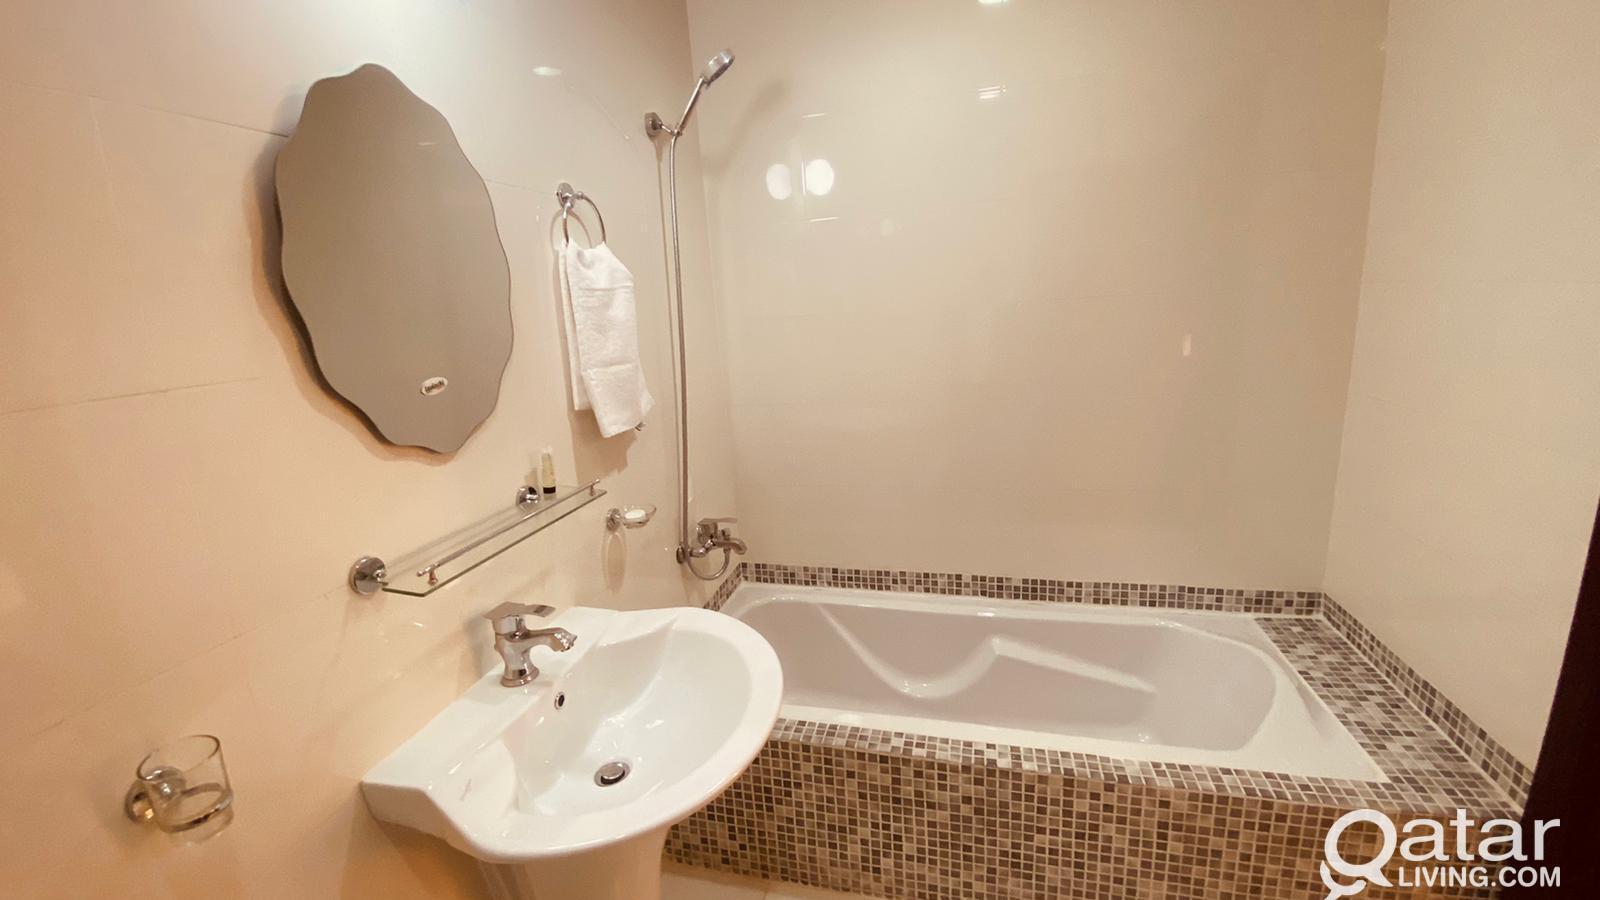 Luxury Hotel Apartment Nice 1BHK Room (Fully Furni